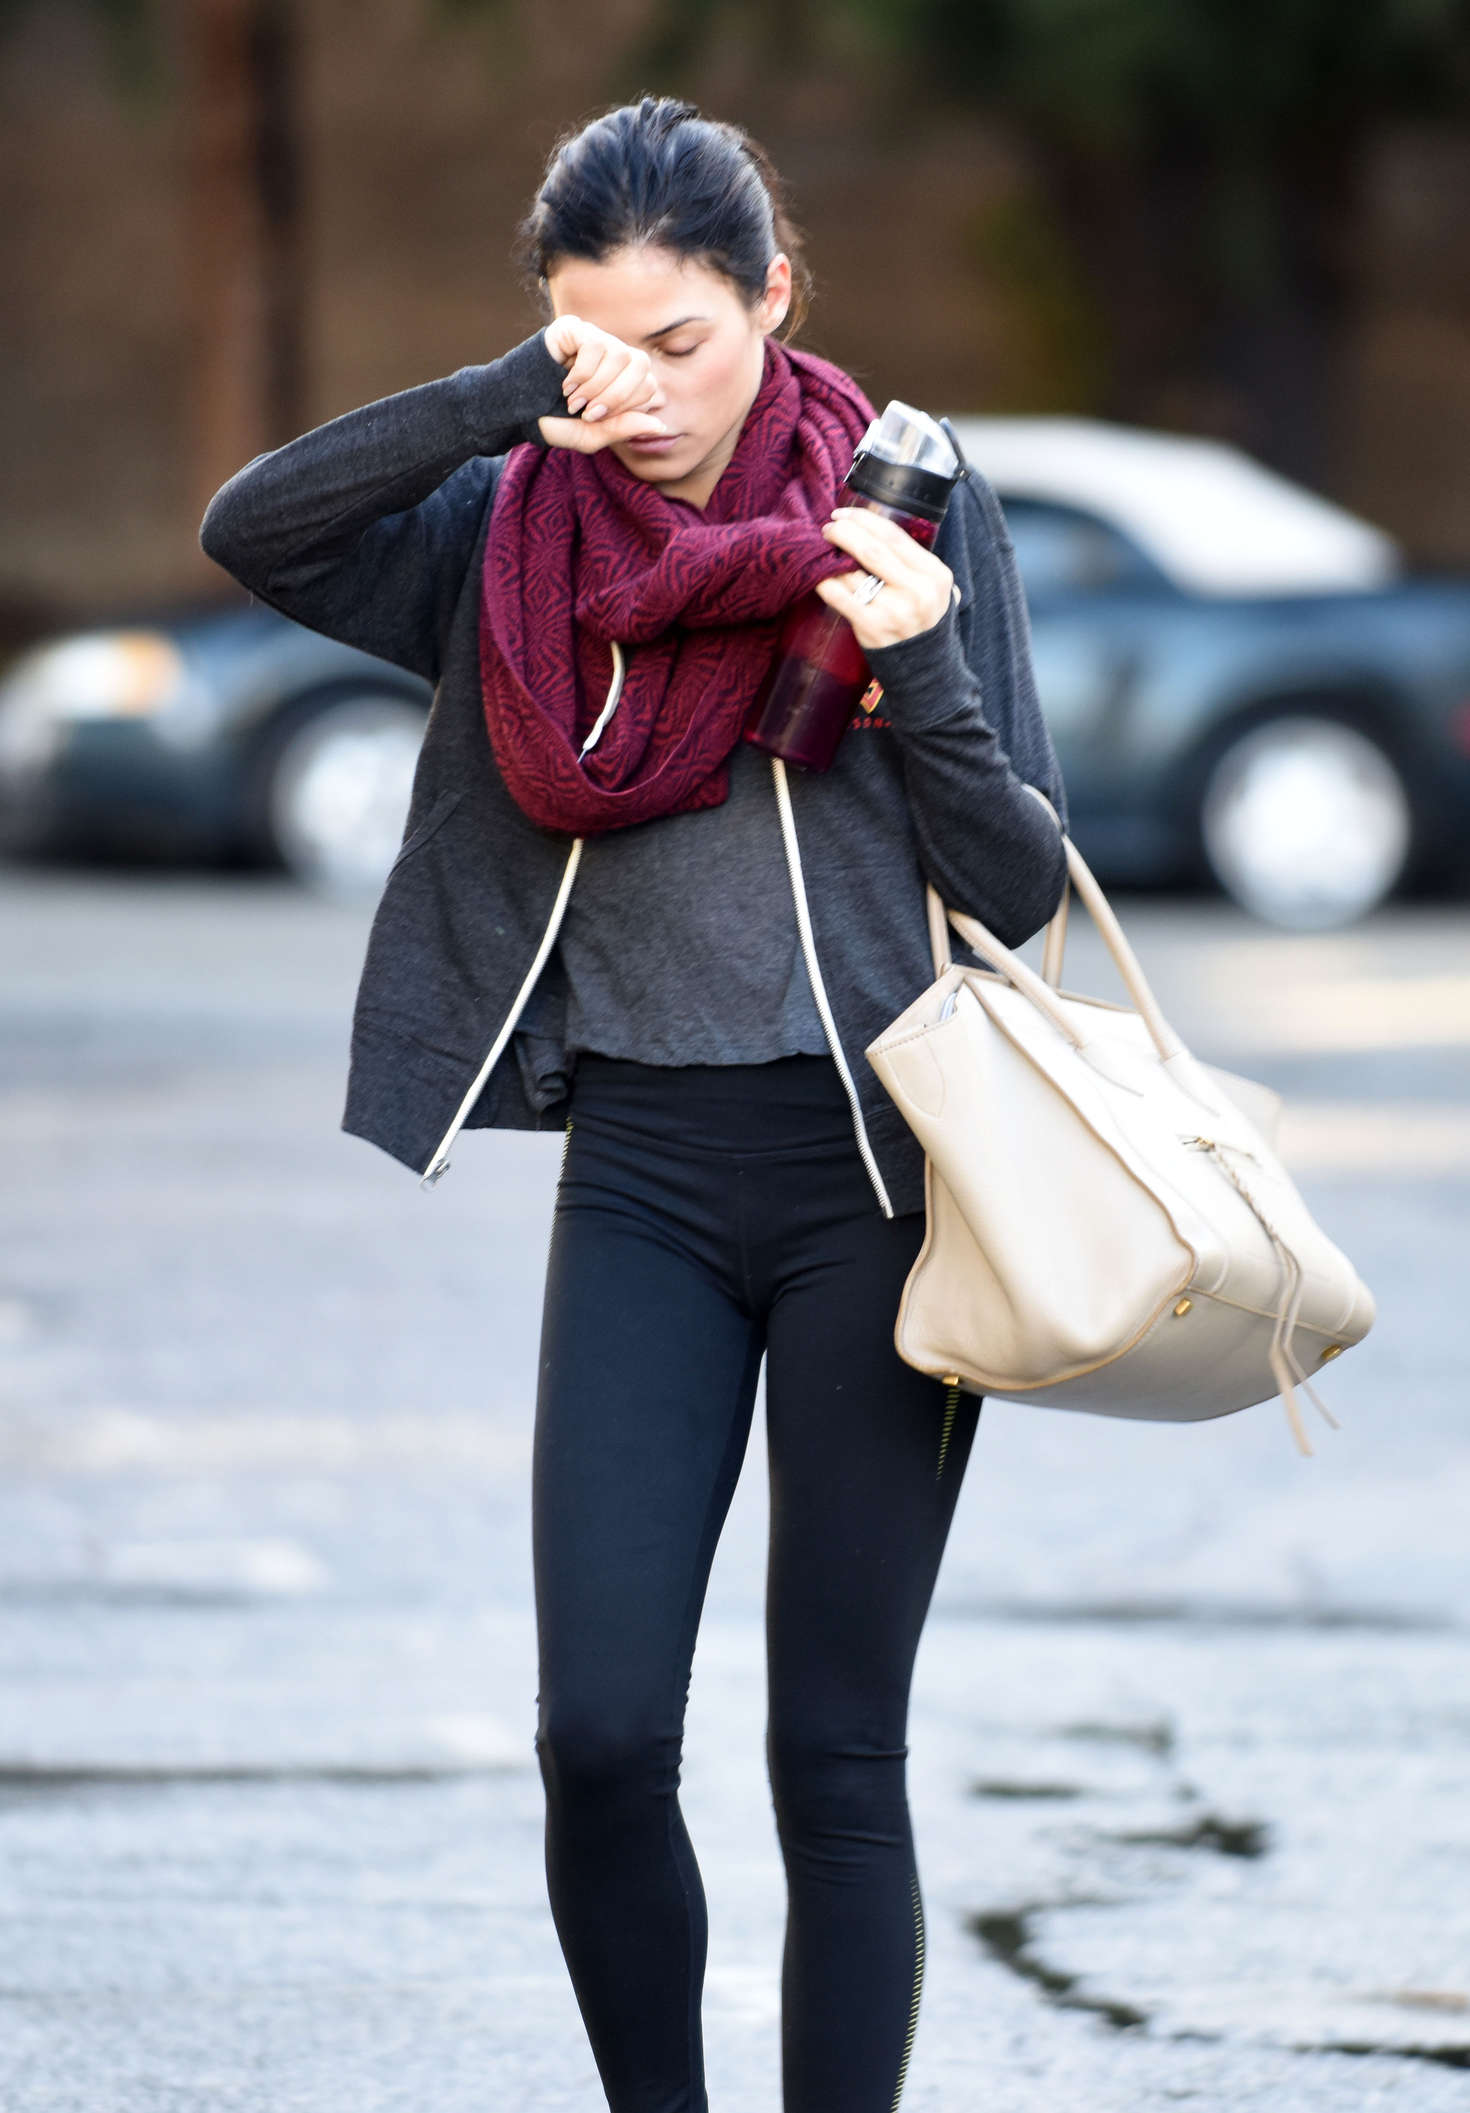 Jenna Dewan Tatum in Tights at Dance studio in LA